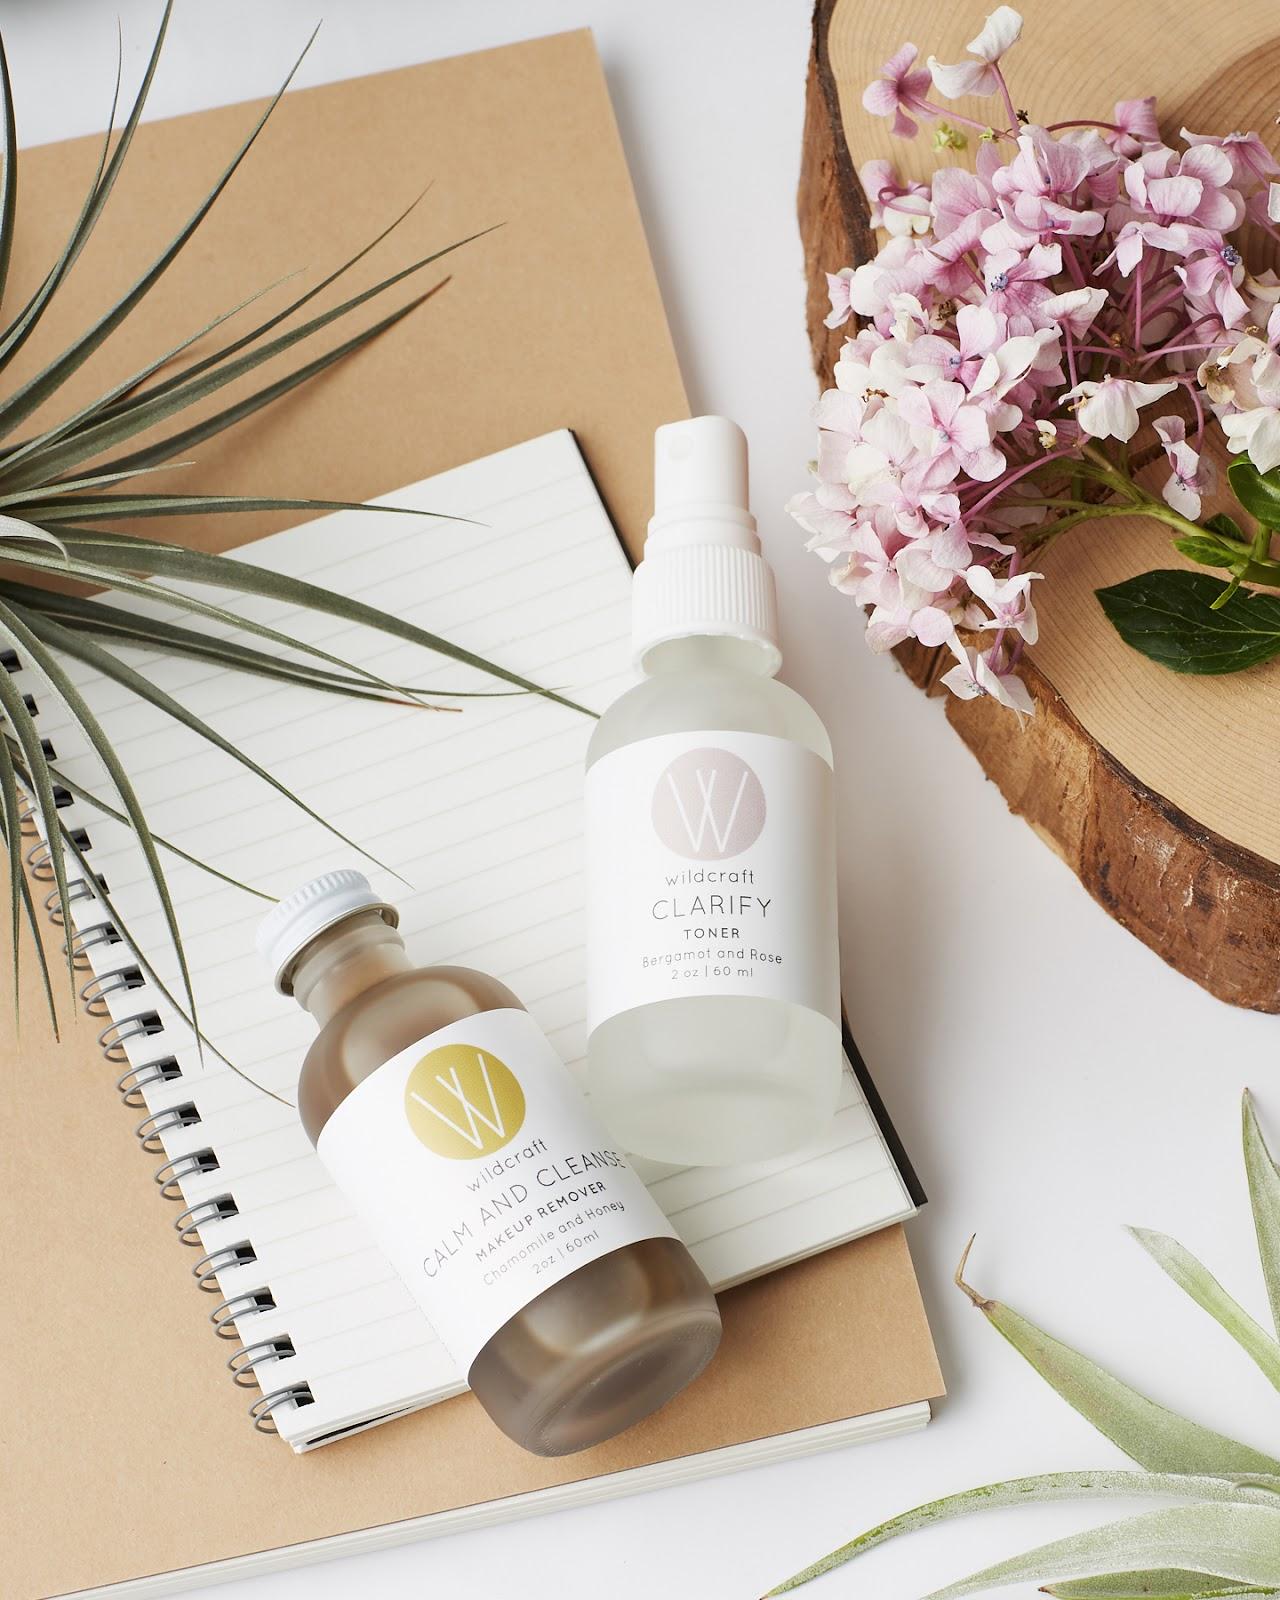 Wildcraft Bergamot Rose Toner + Chamomile Honey Makeup Remover Review organic natural skincare acne oily toronto canada hellolindasau